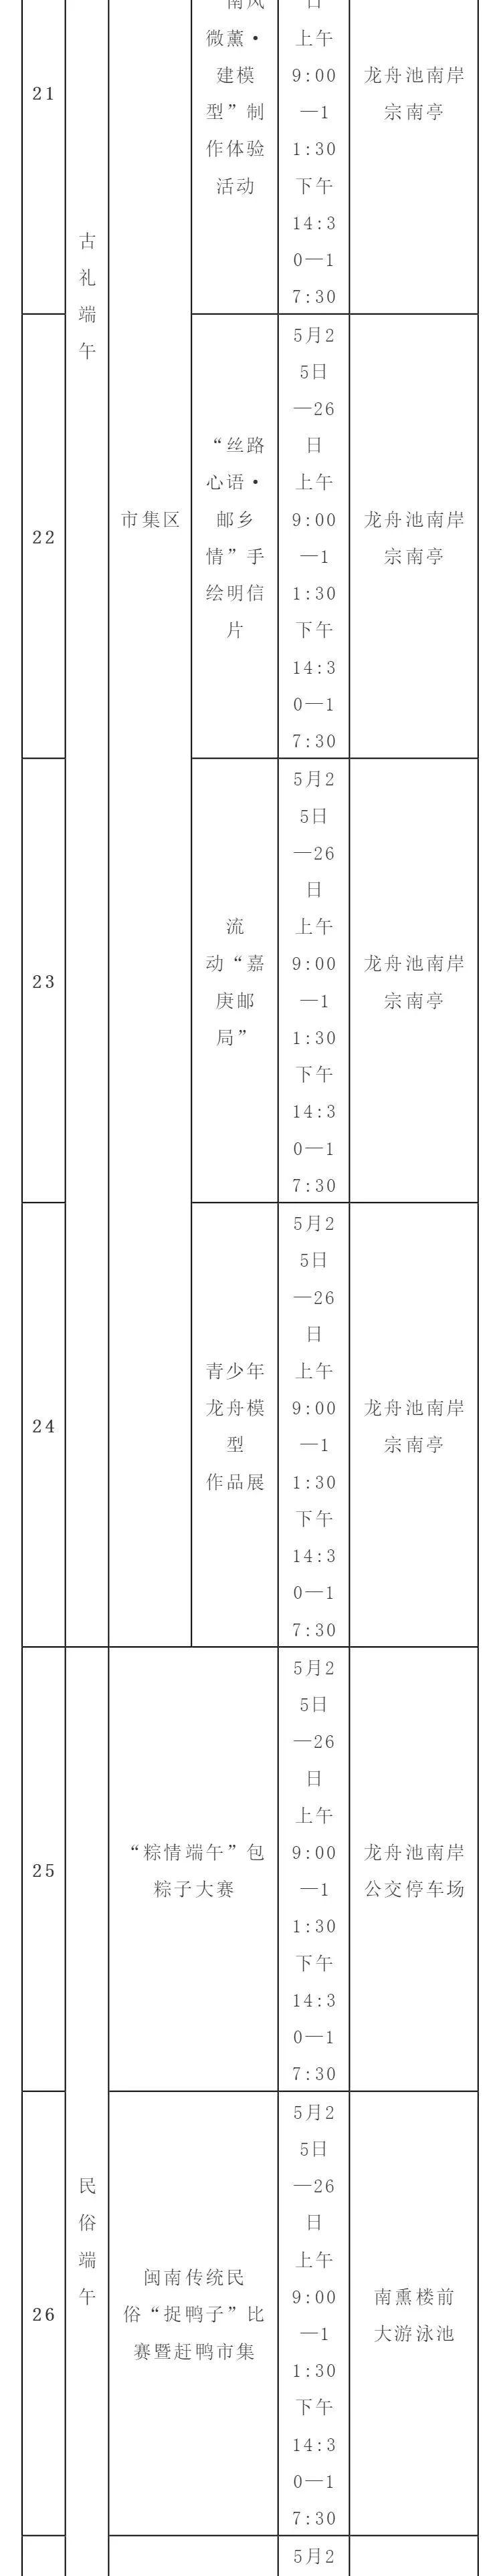 343efb399fcc4583bc40367d4bc51a14.jpeg